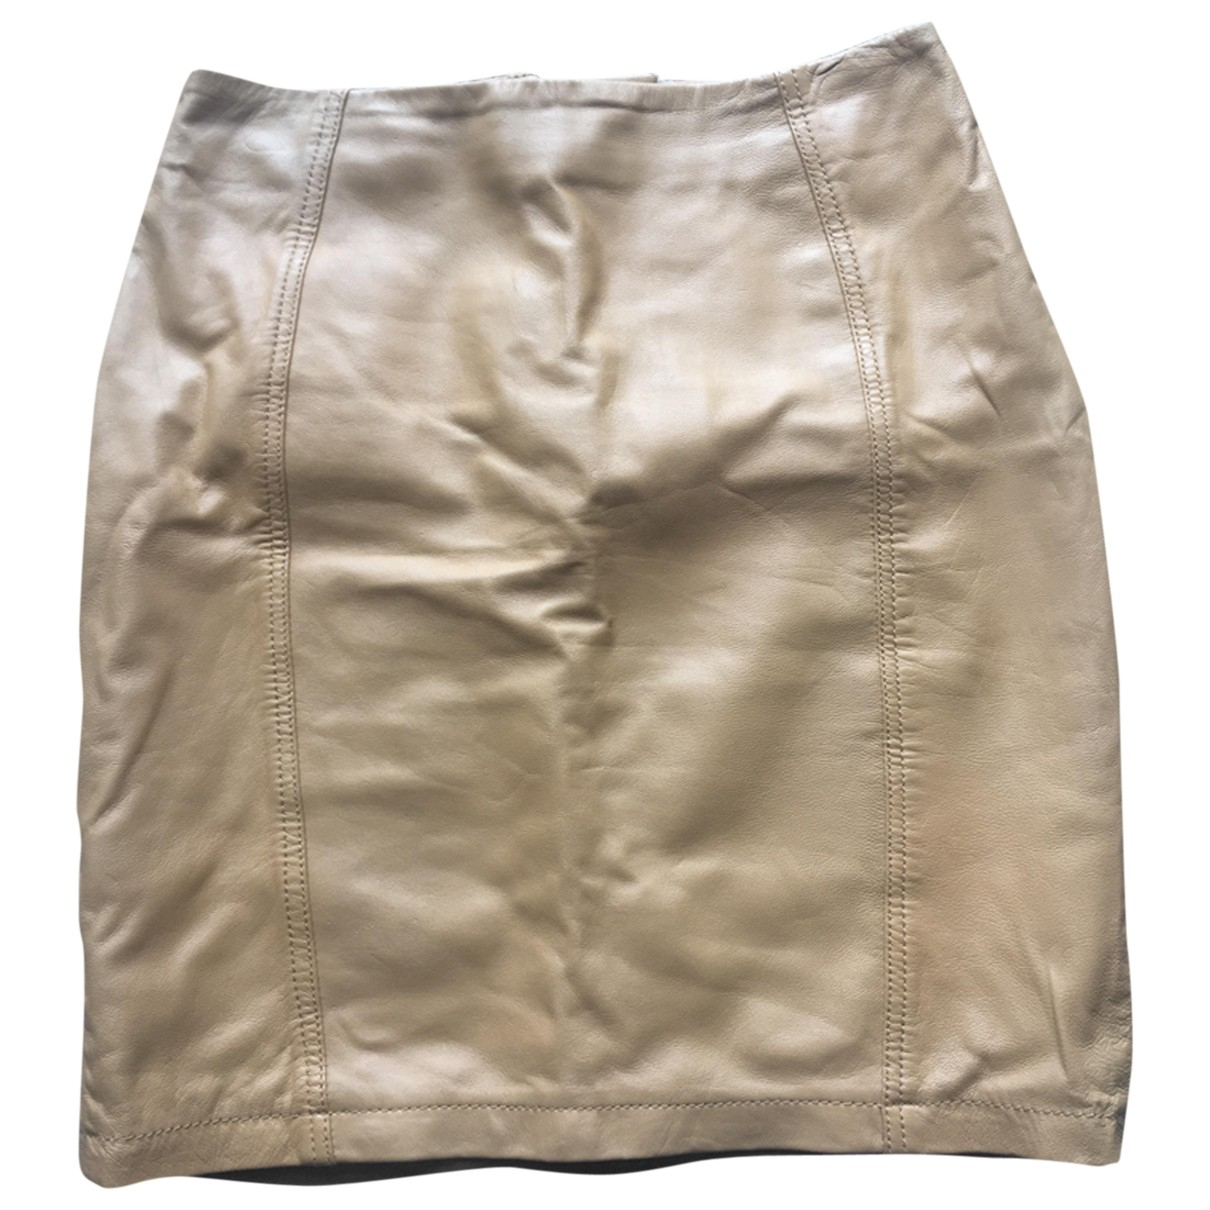 tophop Boutique \N Camel Leather skirt for Women 10 UK